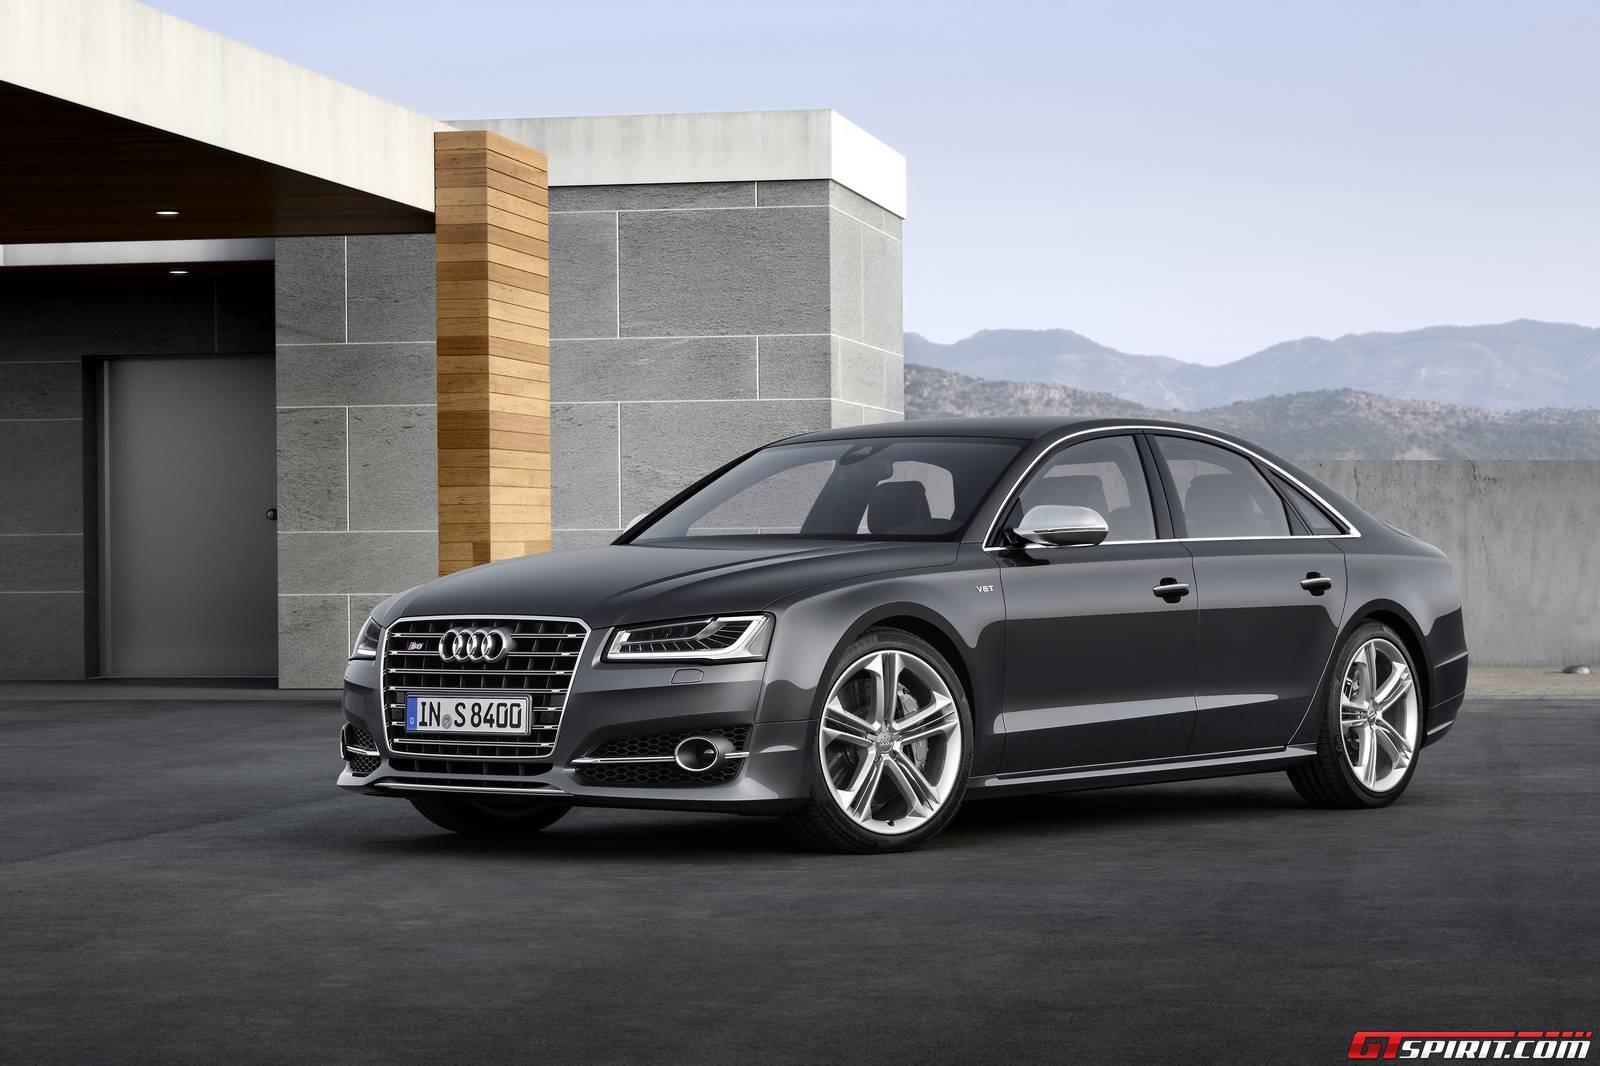 Audi Rs8 Not On The Horizon Gtspirit